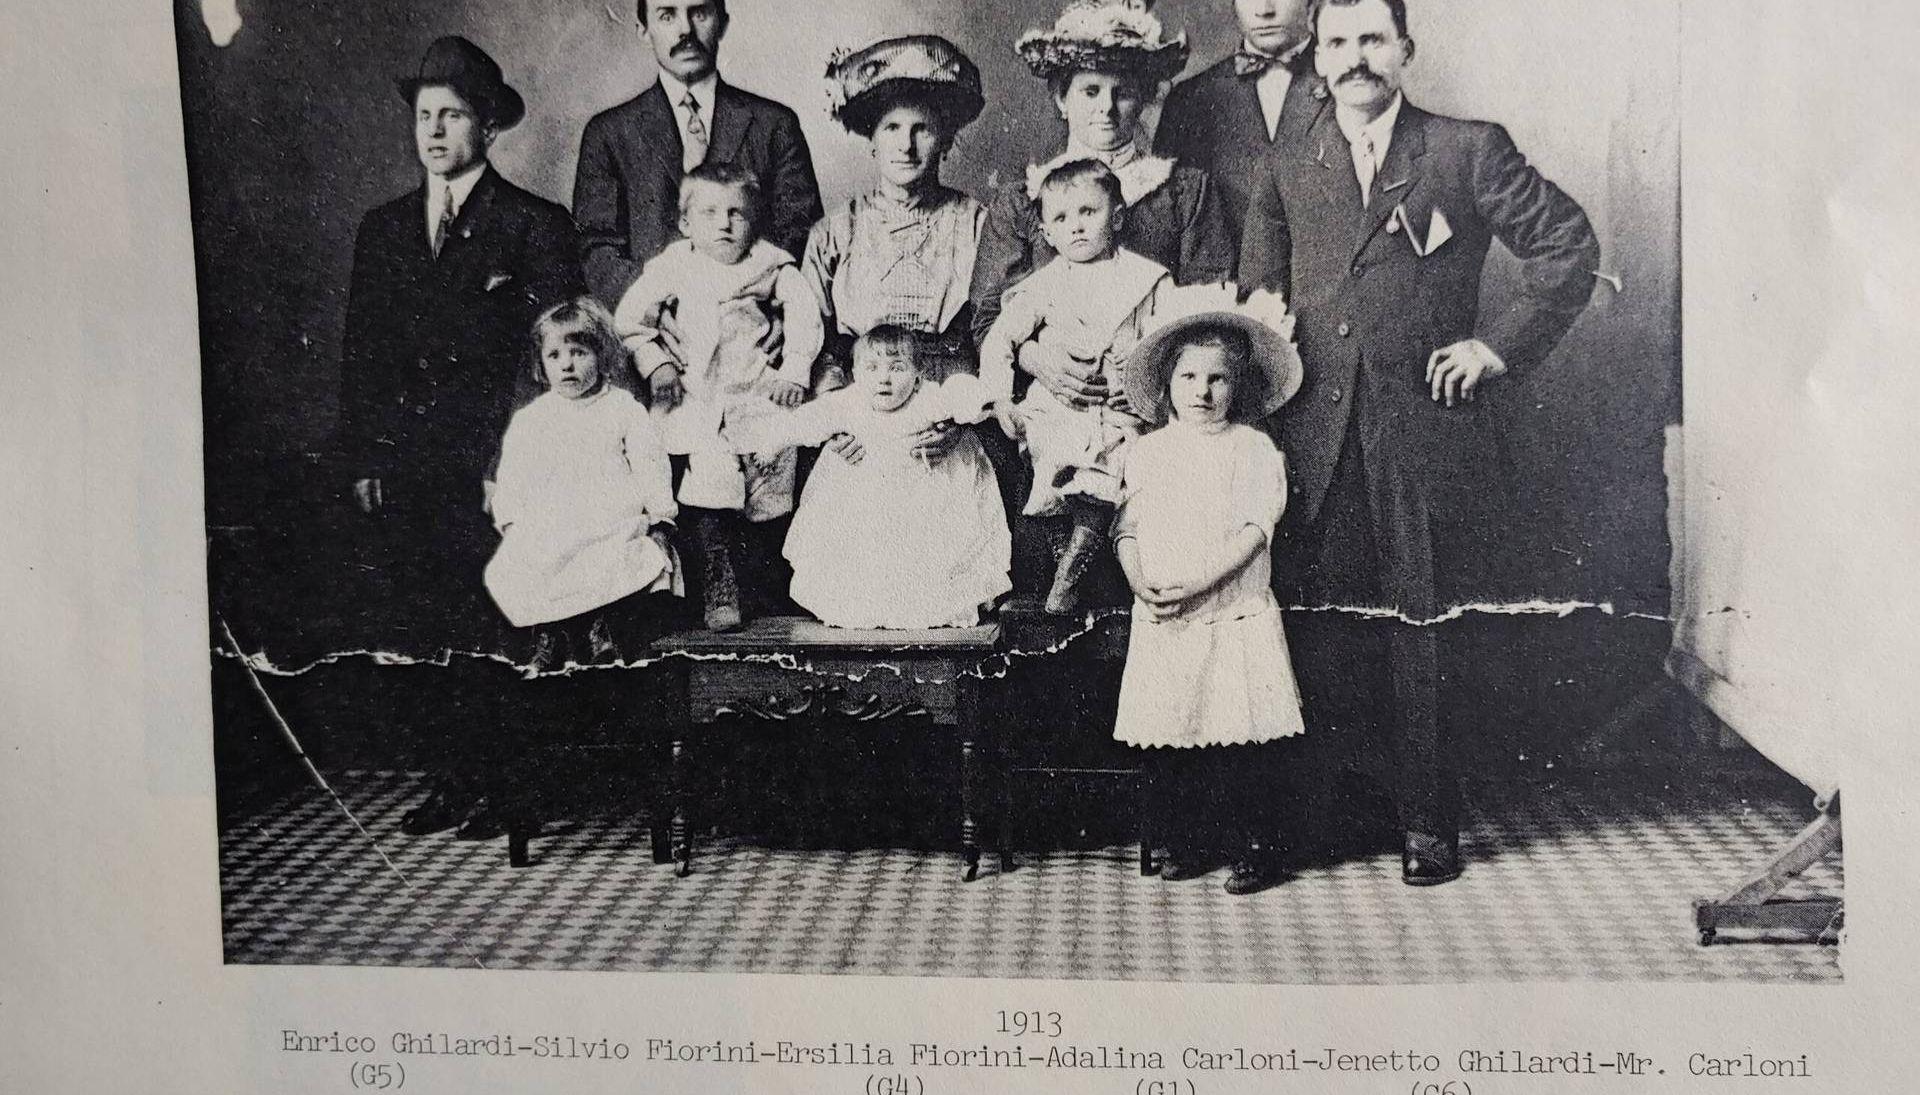 A 1913 portrait of the Ghilardi-Taramelli-Fiorini family